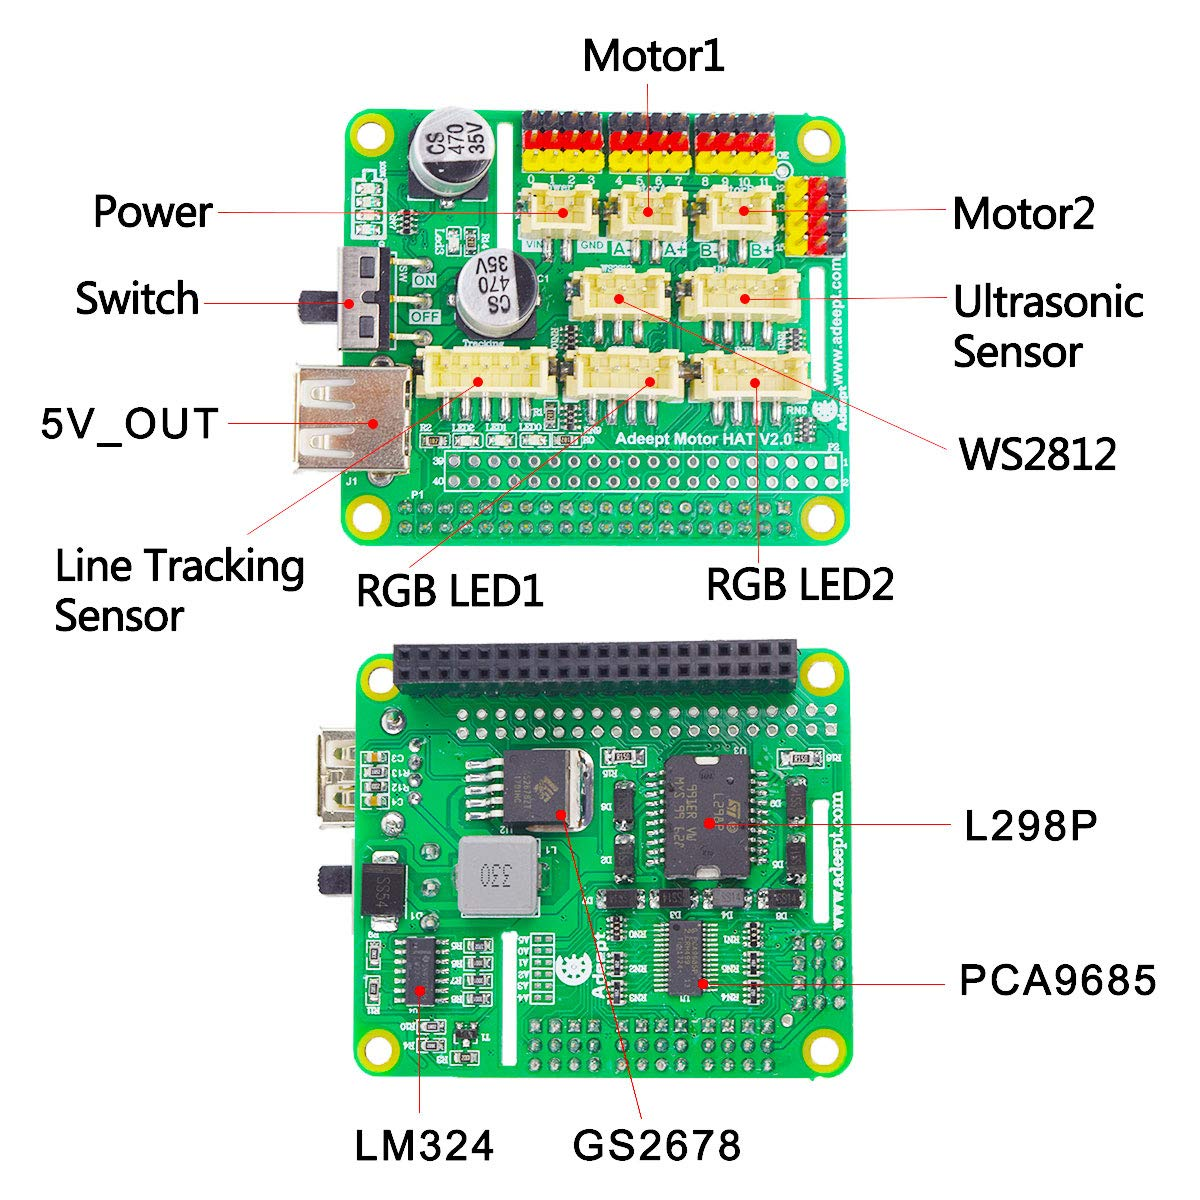 Adeept RaspTank WiFi Wireless Smart Robot Car Kit for Raspberry Pi 3 Model  B+/B/2B, Tank Tracked Robot with 4-DOF Robotic Arm, OpenCV Target Tracking,